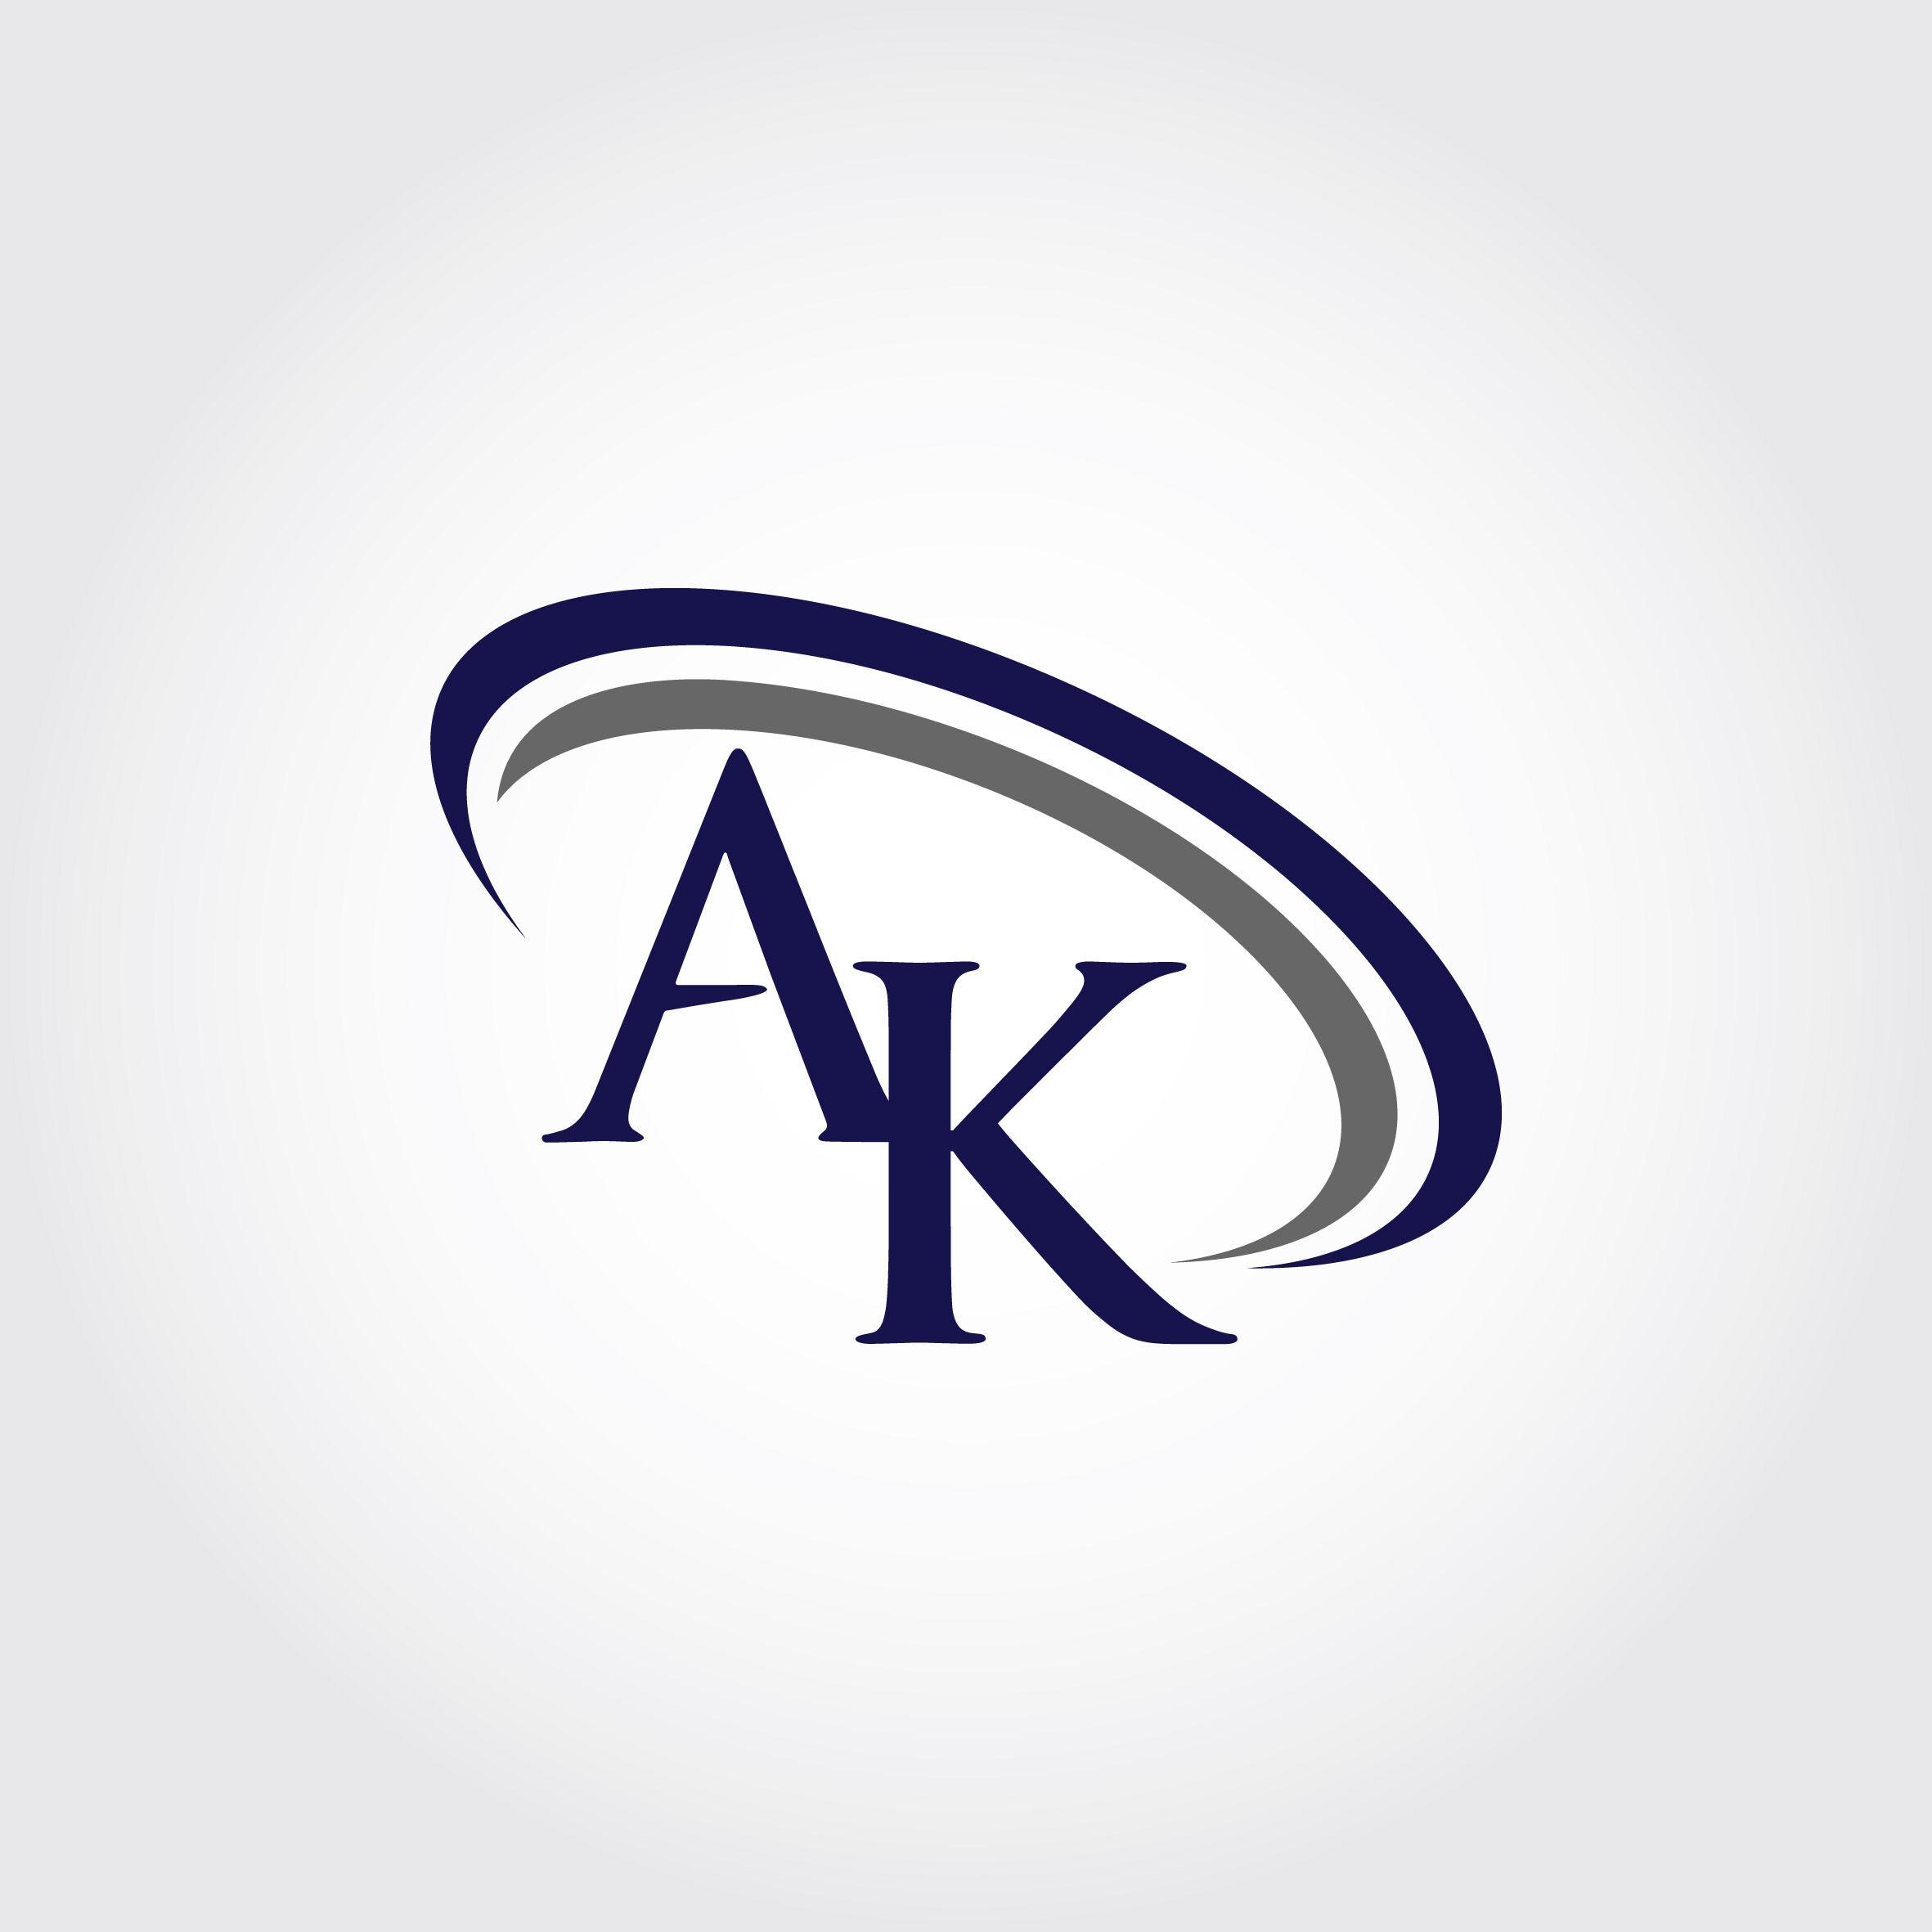 Monogram AK Logo Design By Vectorseller.